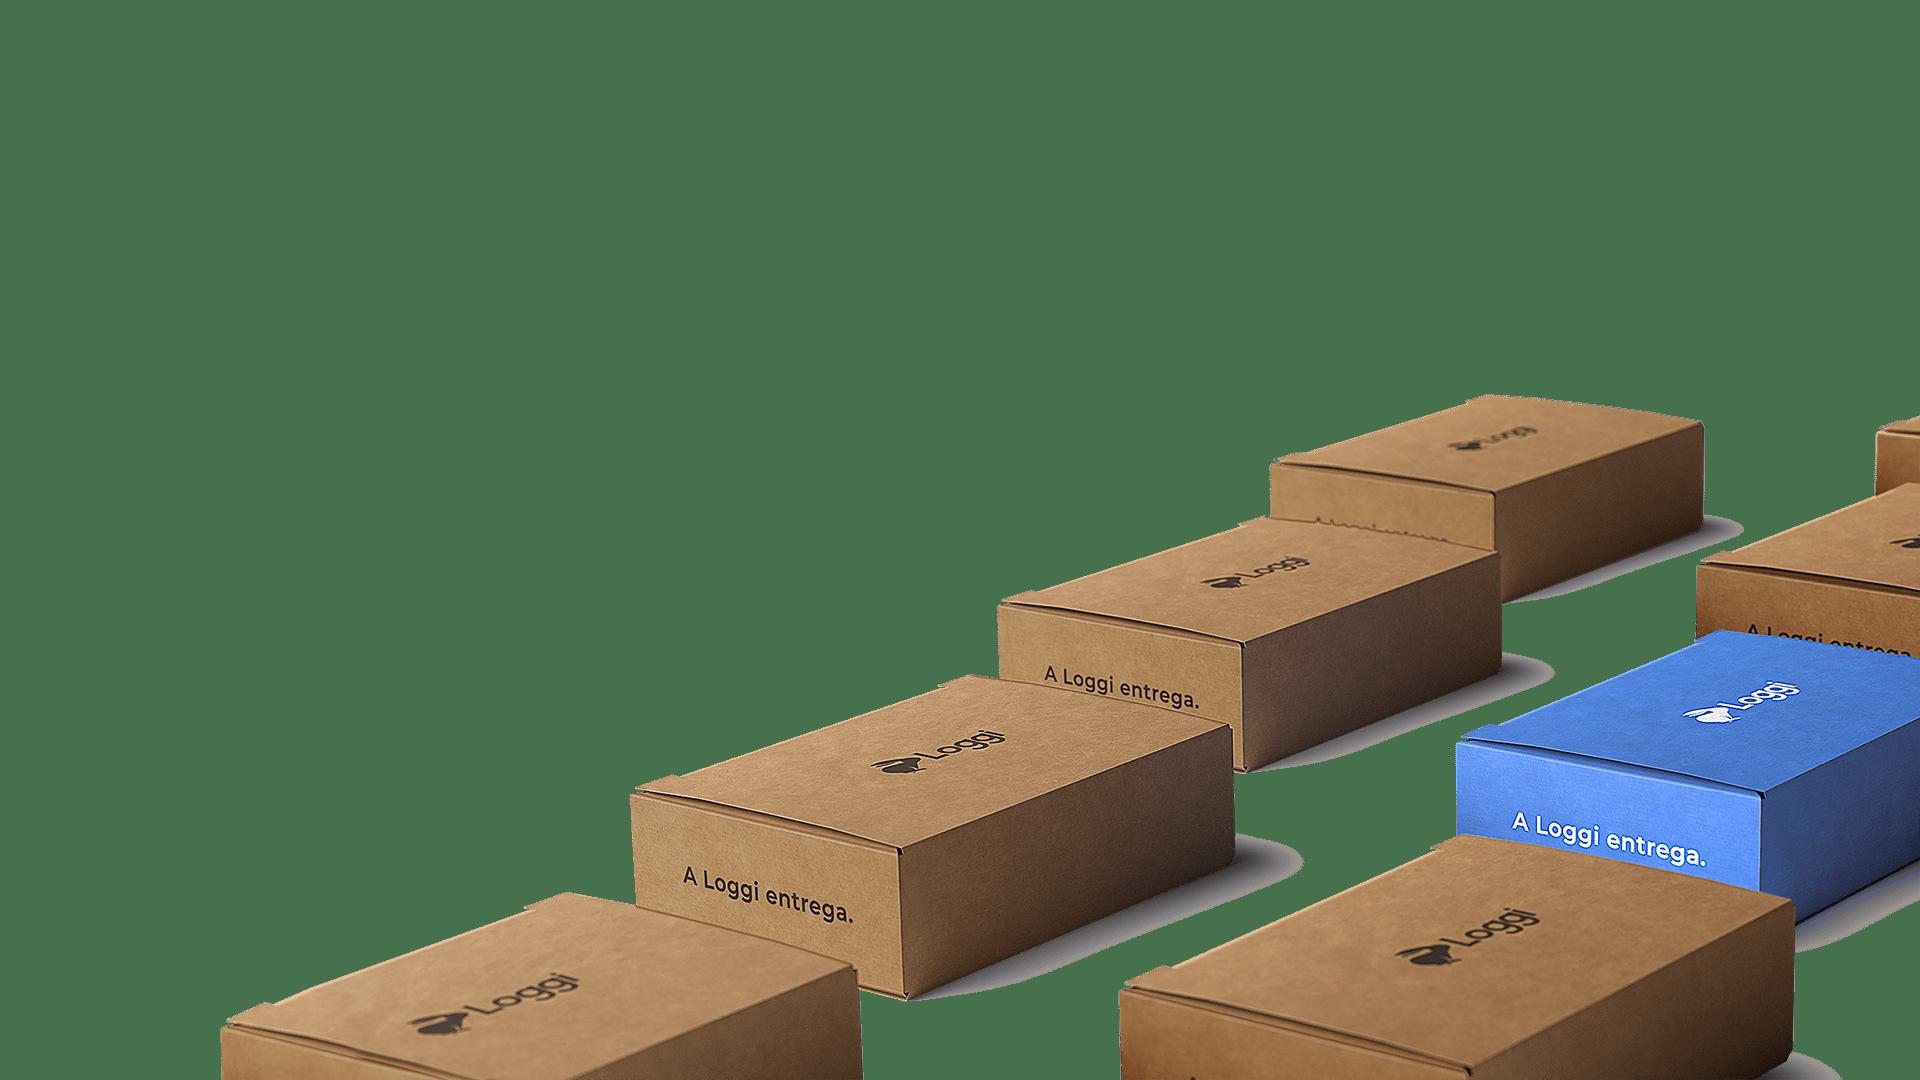 Caixas Loggi prontas para serem entregues para todoo Brasil